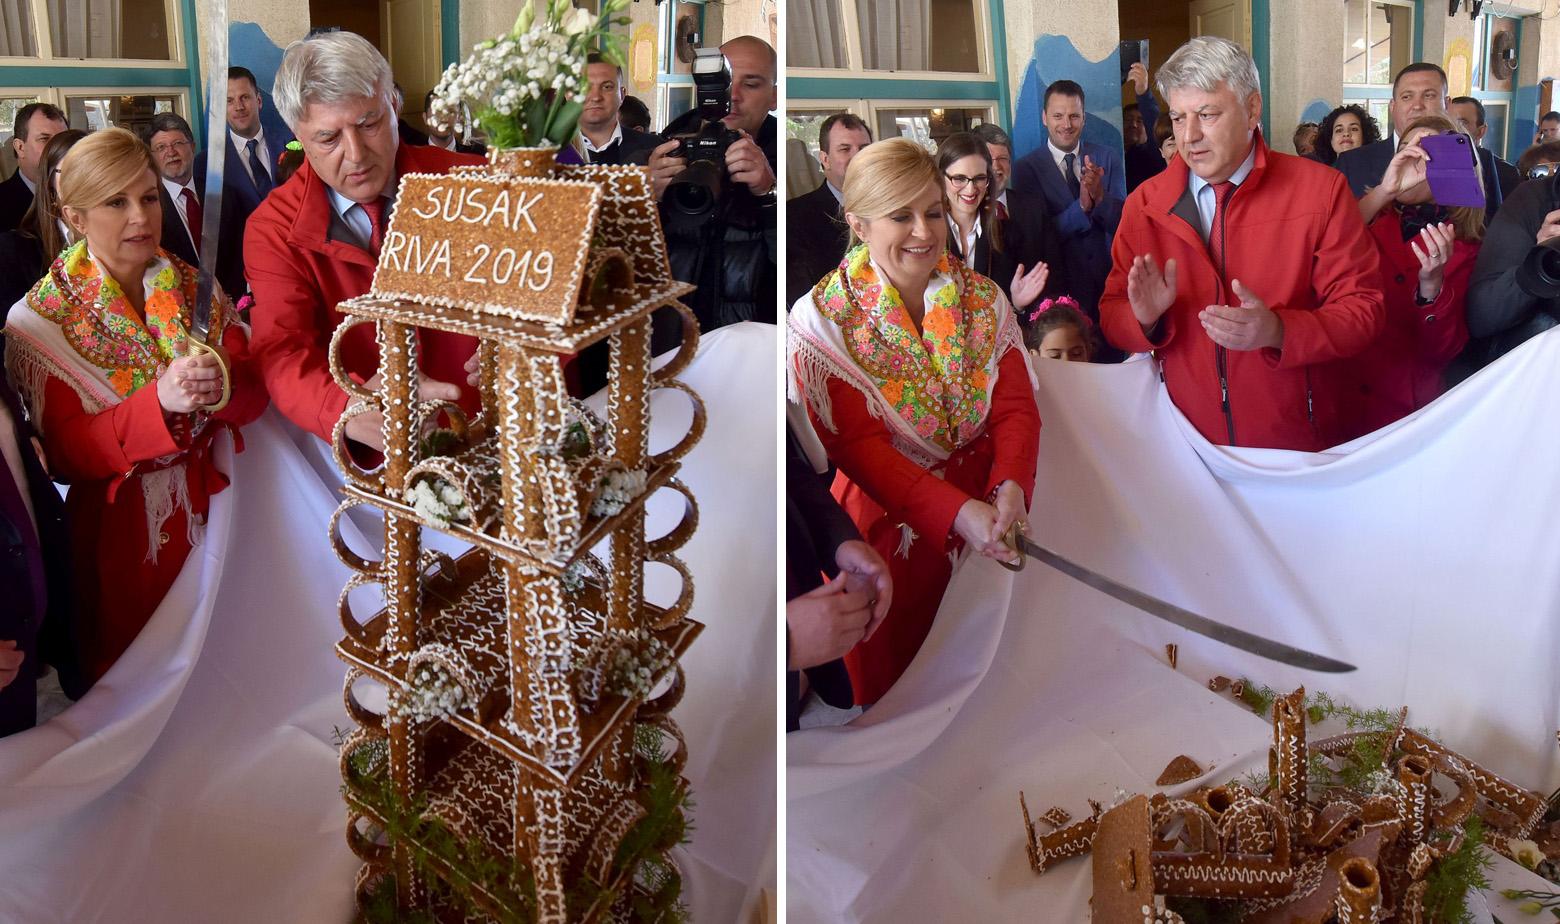 Predsjednica Kolinda Grabar Kitarović sabljom je presjekla slatki lošinjski krokant